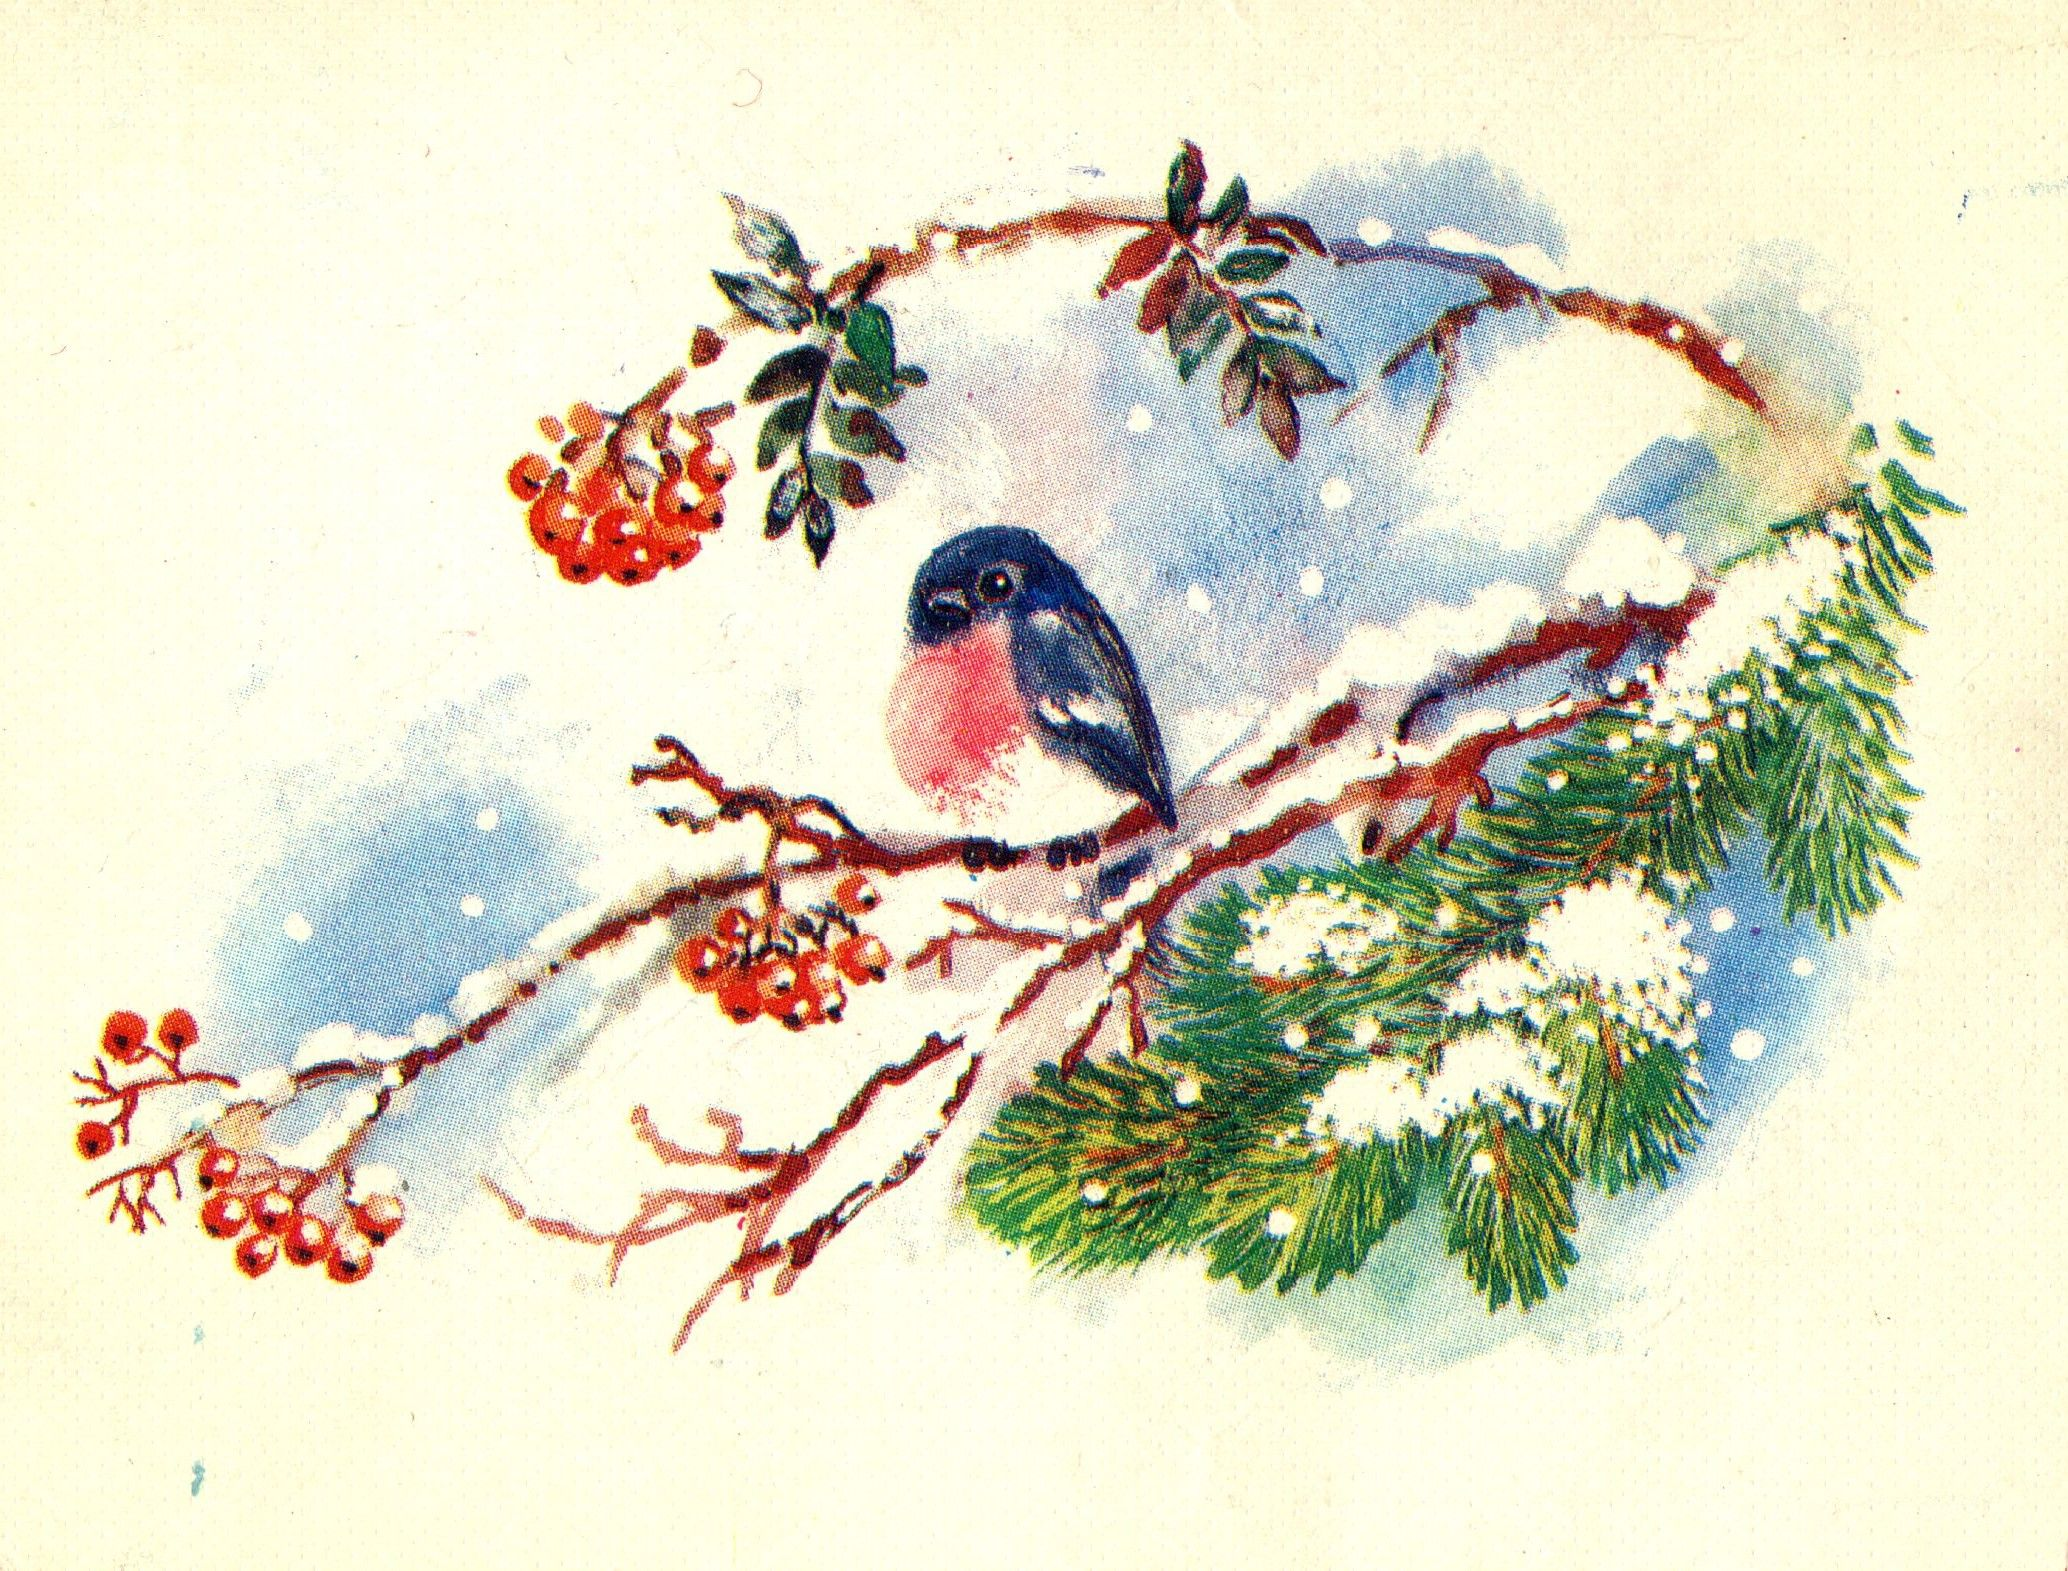 снегурочка в санях со снегирями картинки